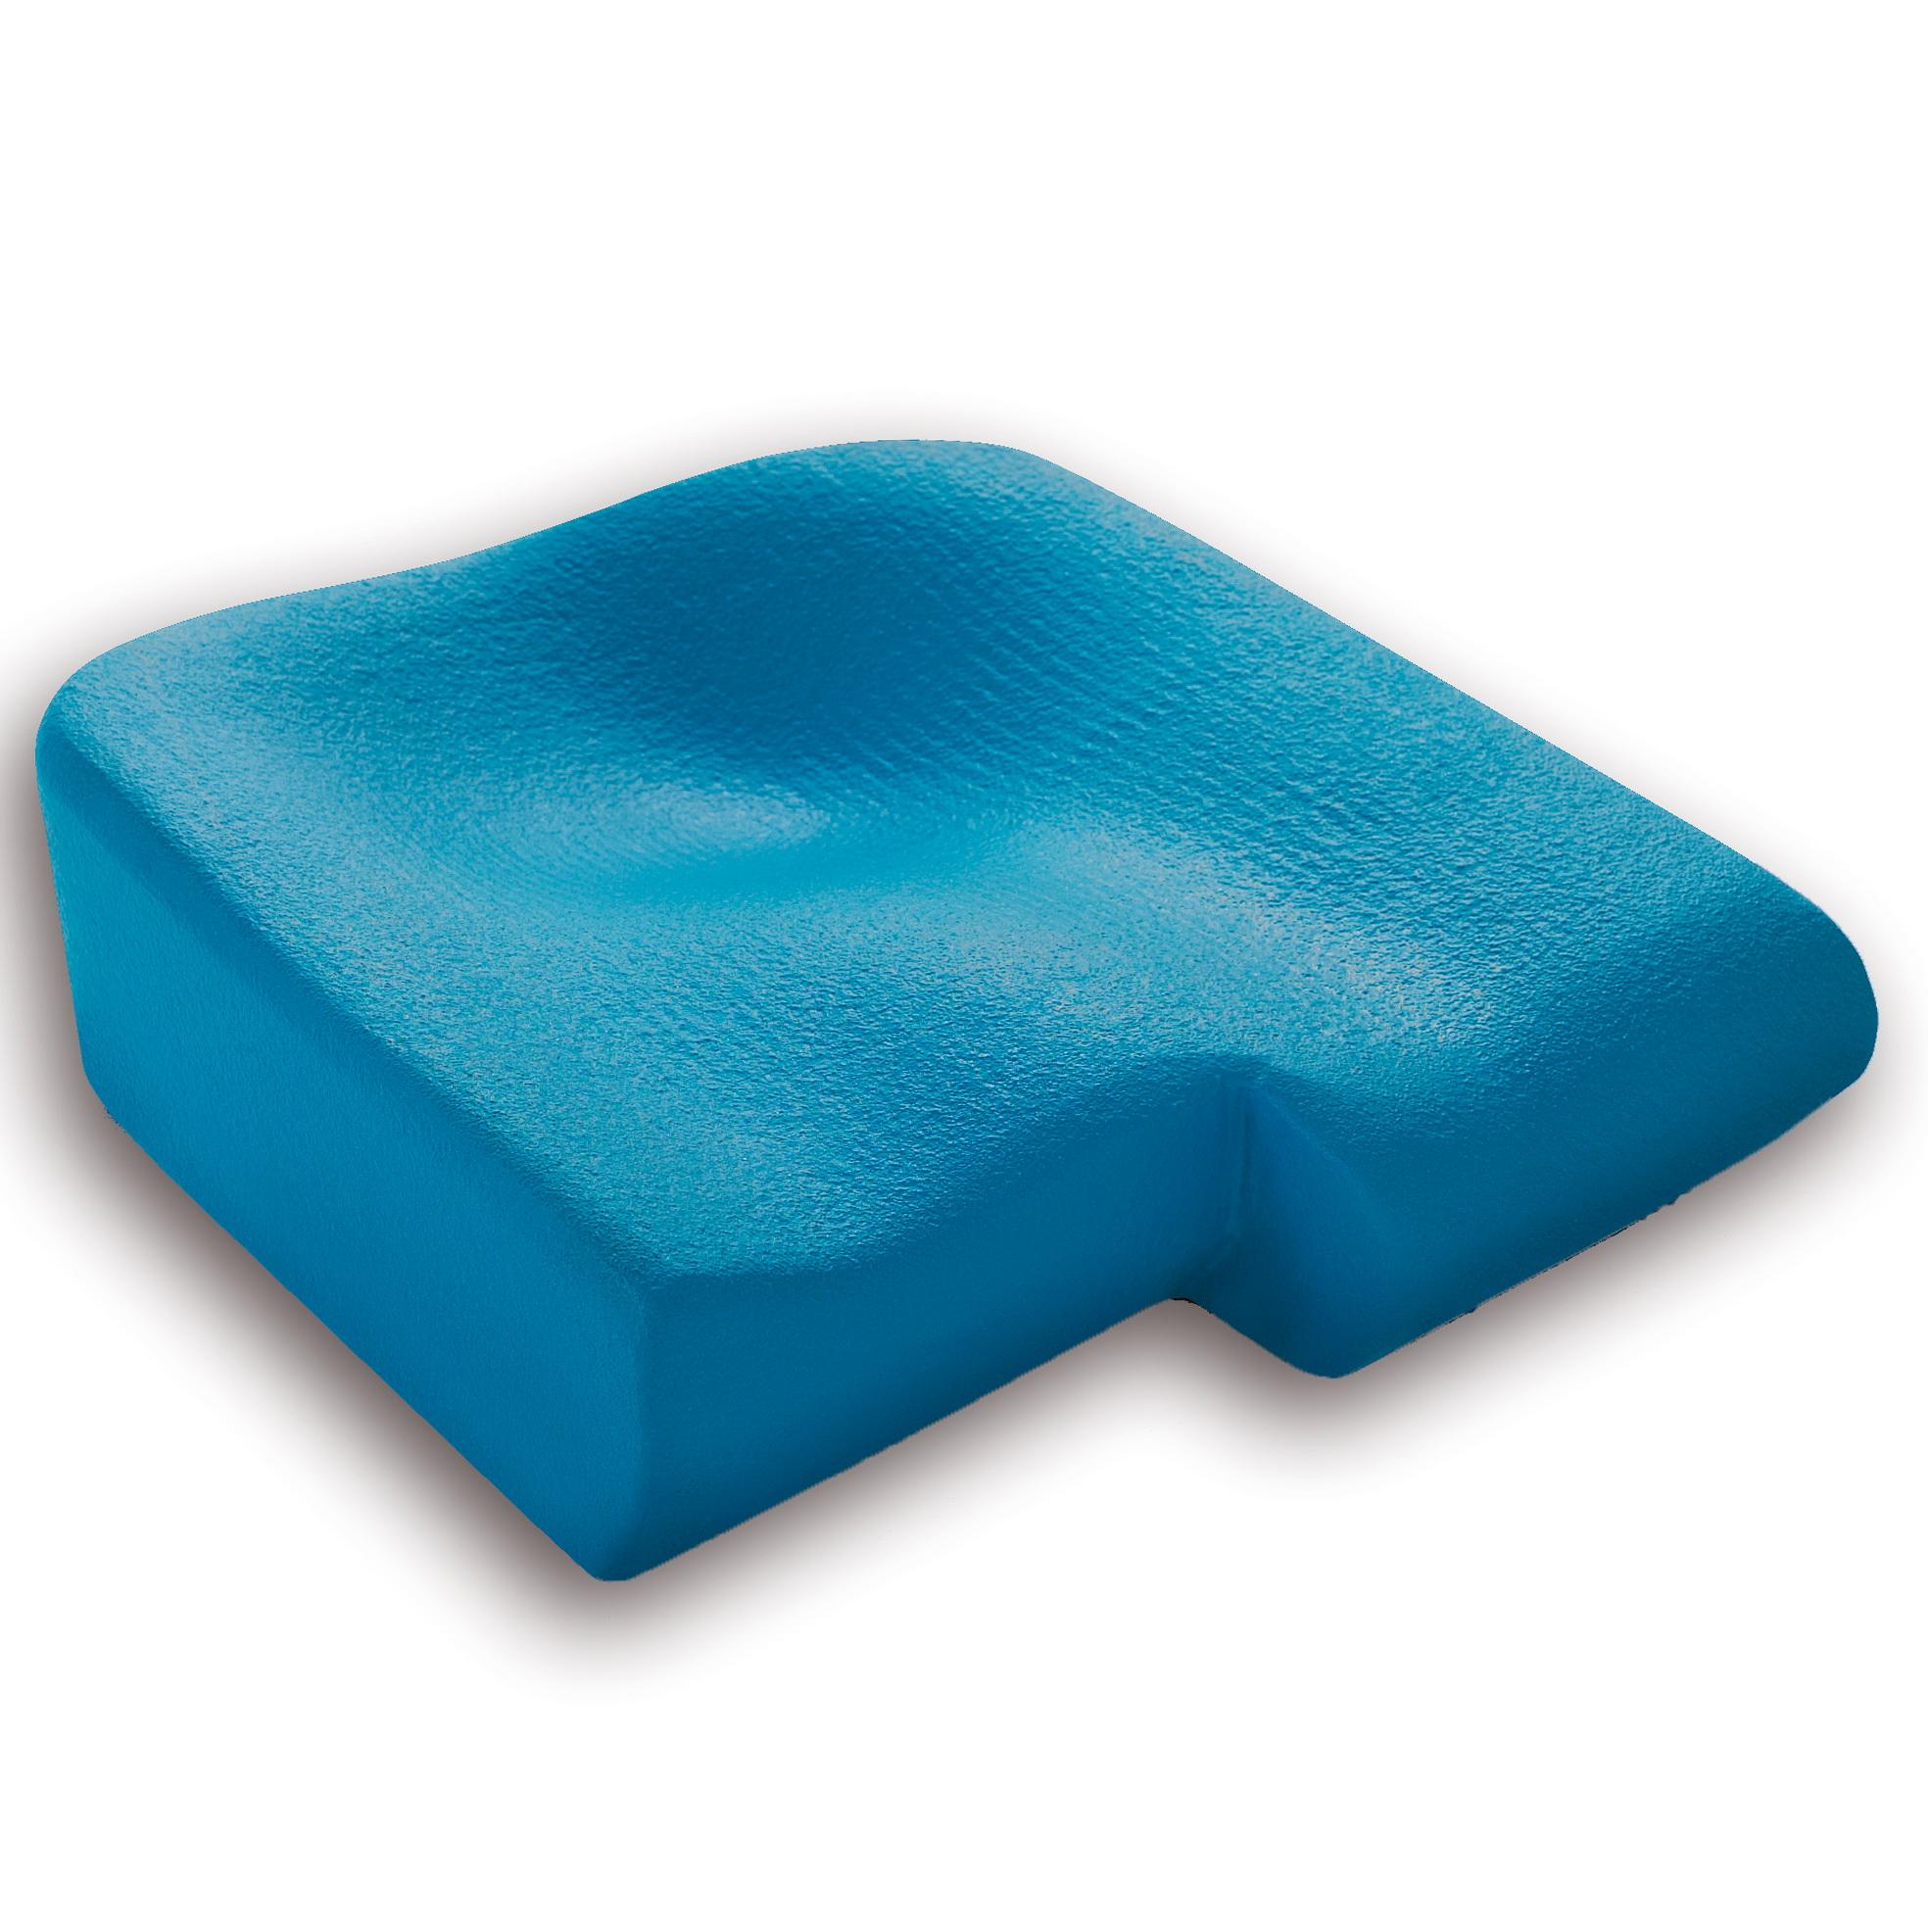 Motorcycle Seat Cushion Foam Home Design Ideas